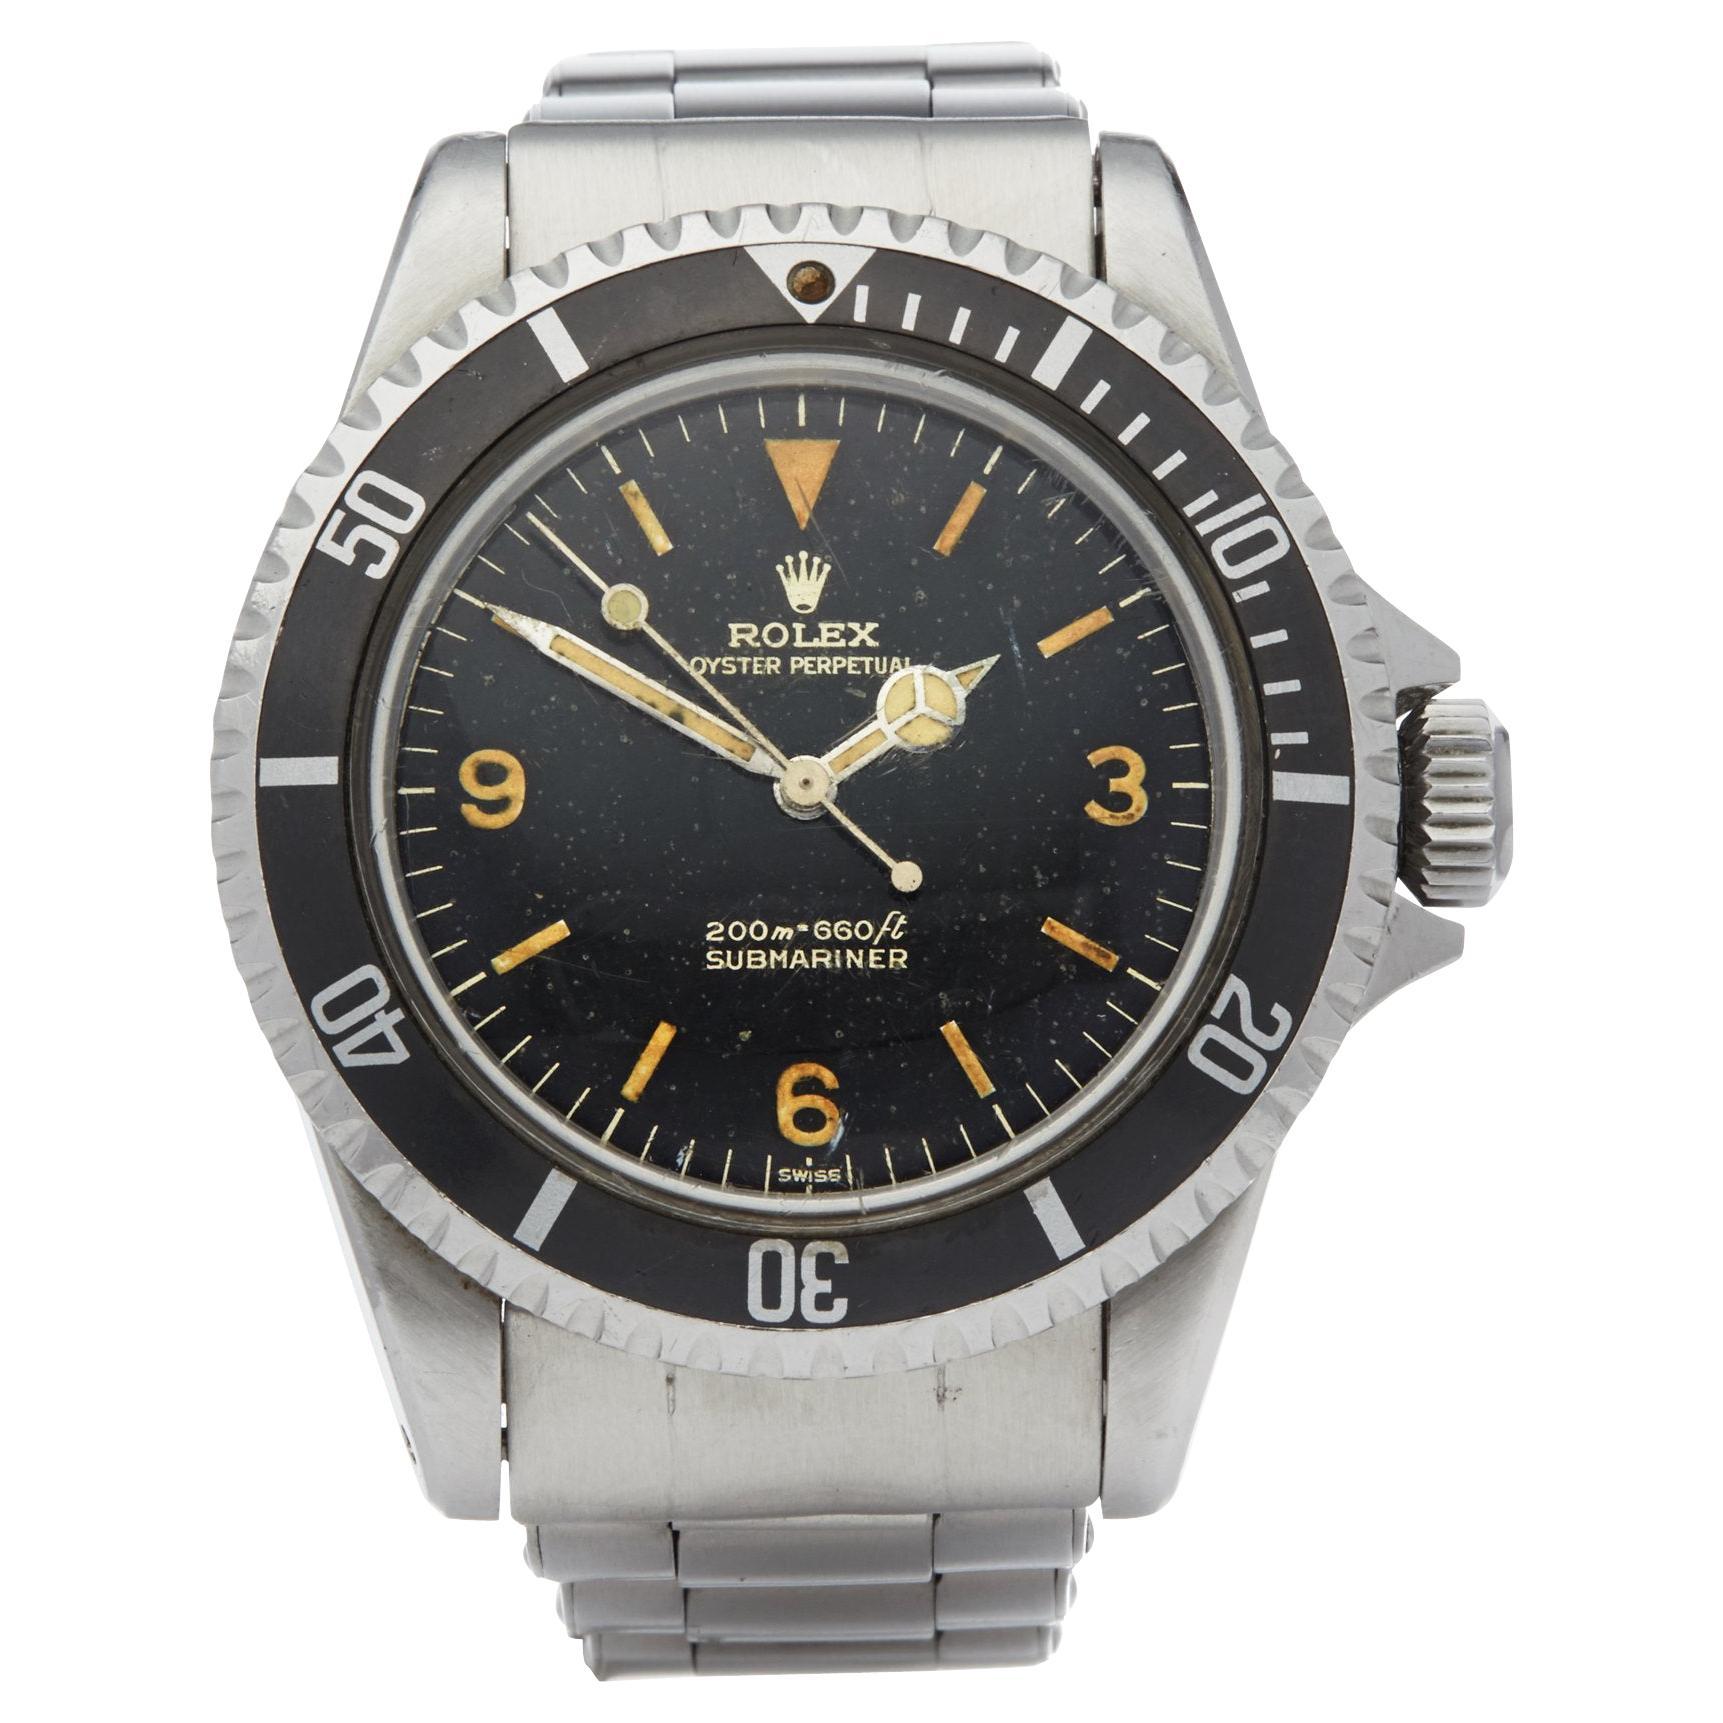 "Rolex Submariner 0 5513 Men Stainless Steel Gilt Explorer ""Kissing L"" Dial Watch"